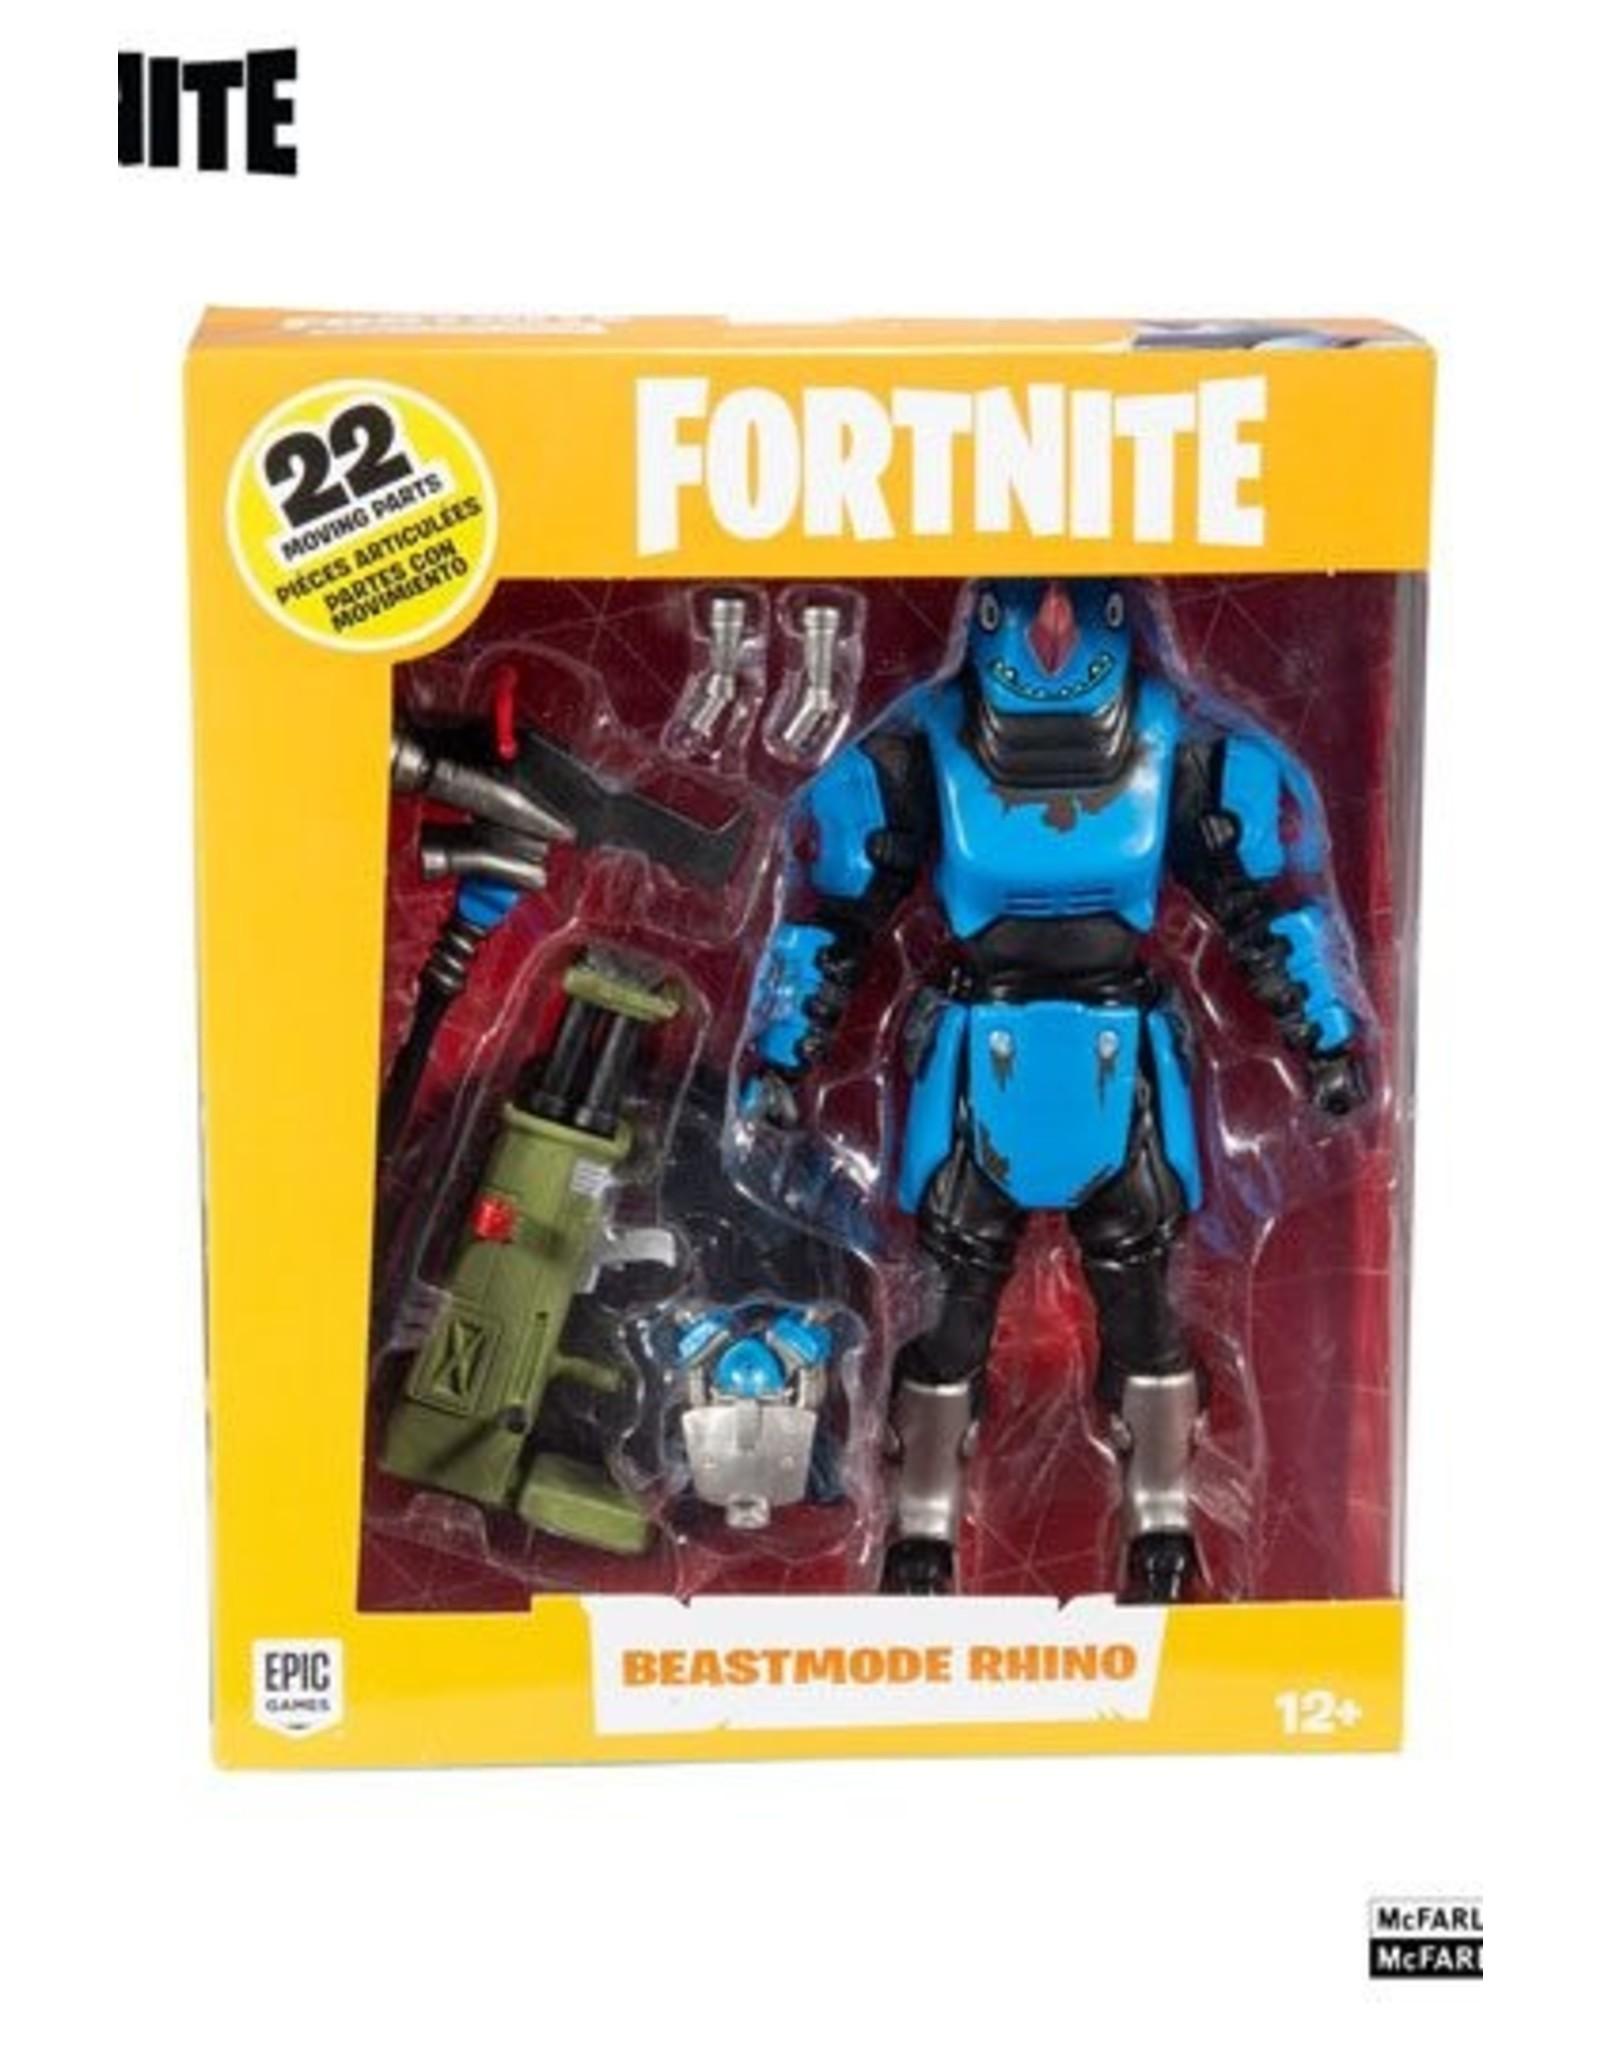 MCFARLANE TOYS Fortnite Action Figure Beastmode Rhino 18 cm